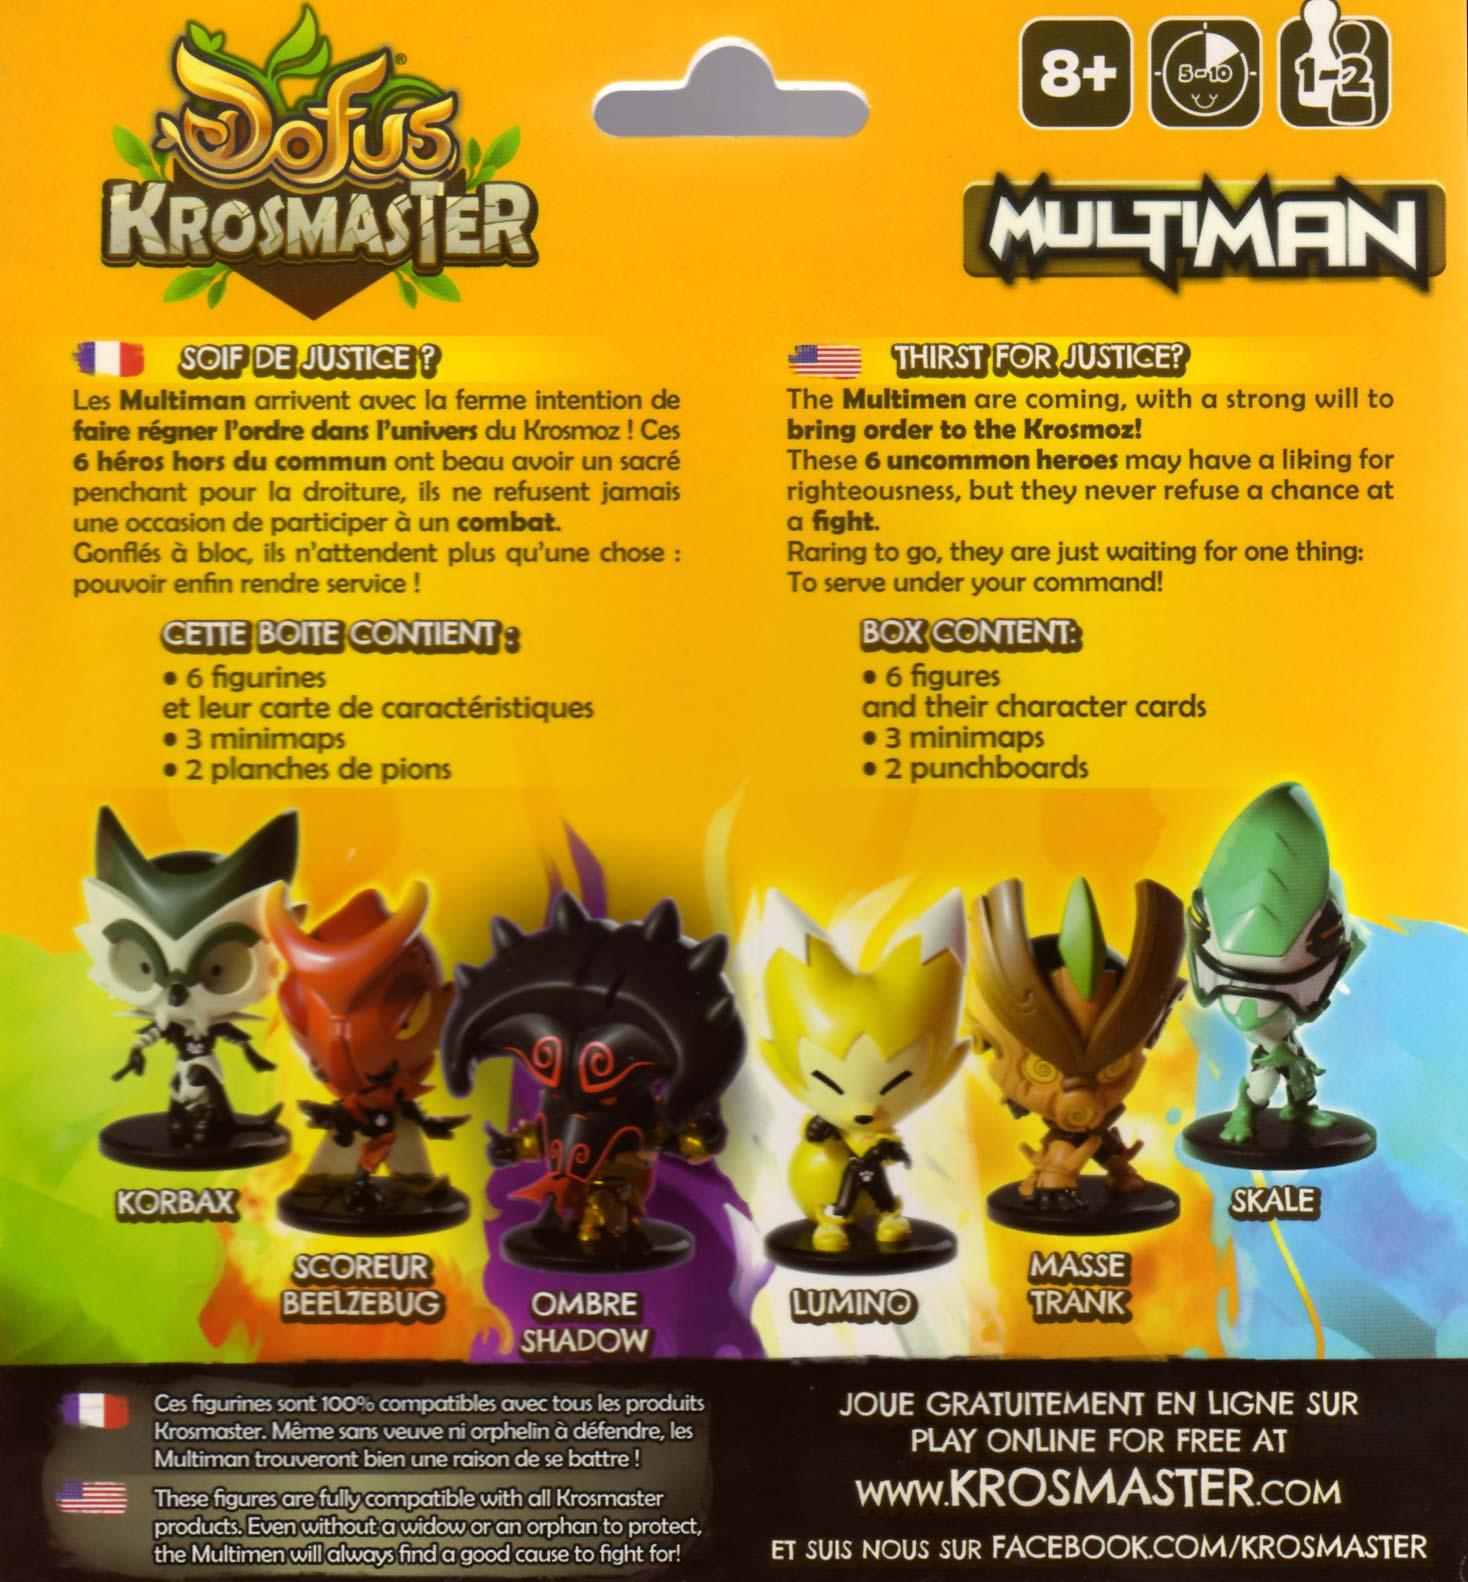 Dos du Pack Krosmaster Multiman